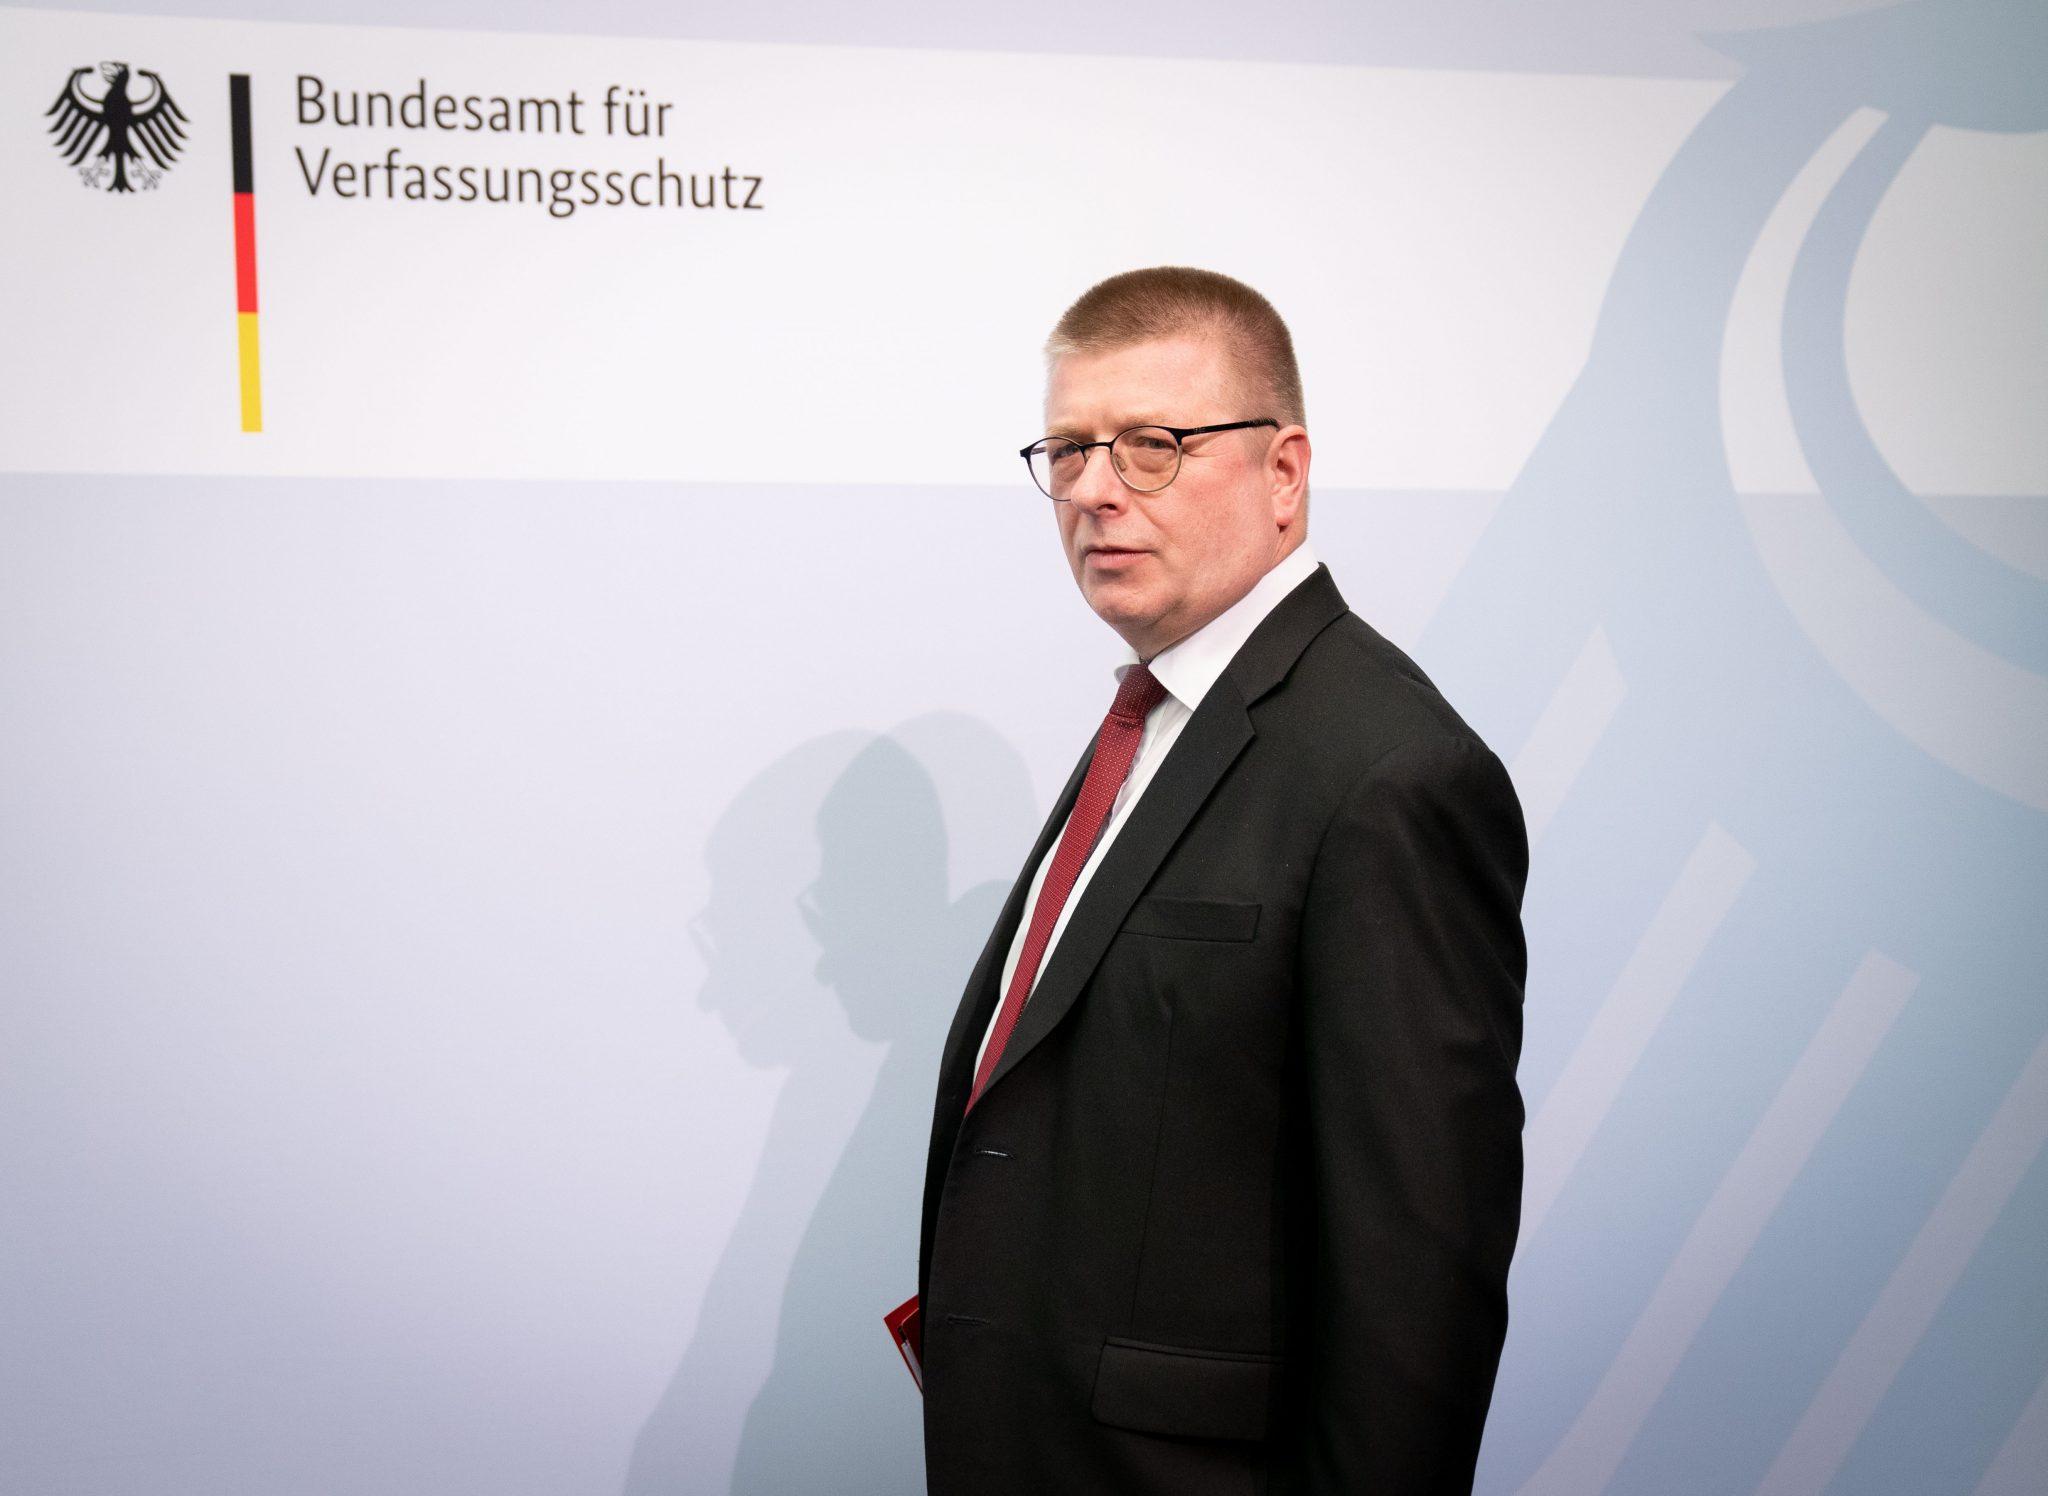 Thomas Haldenwang